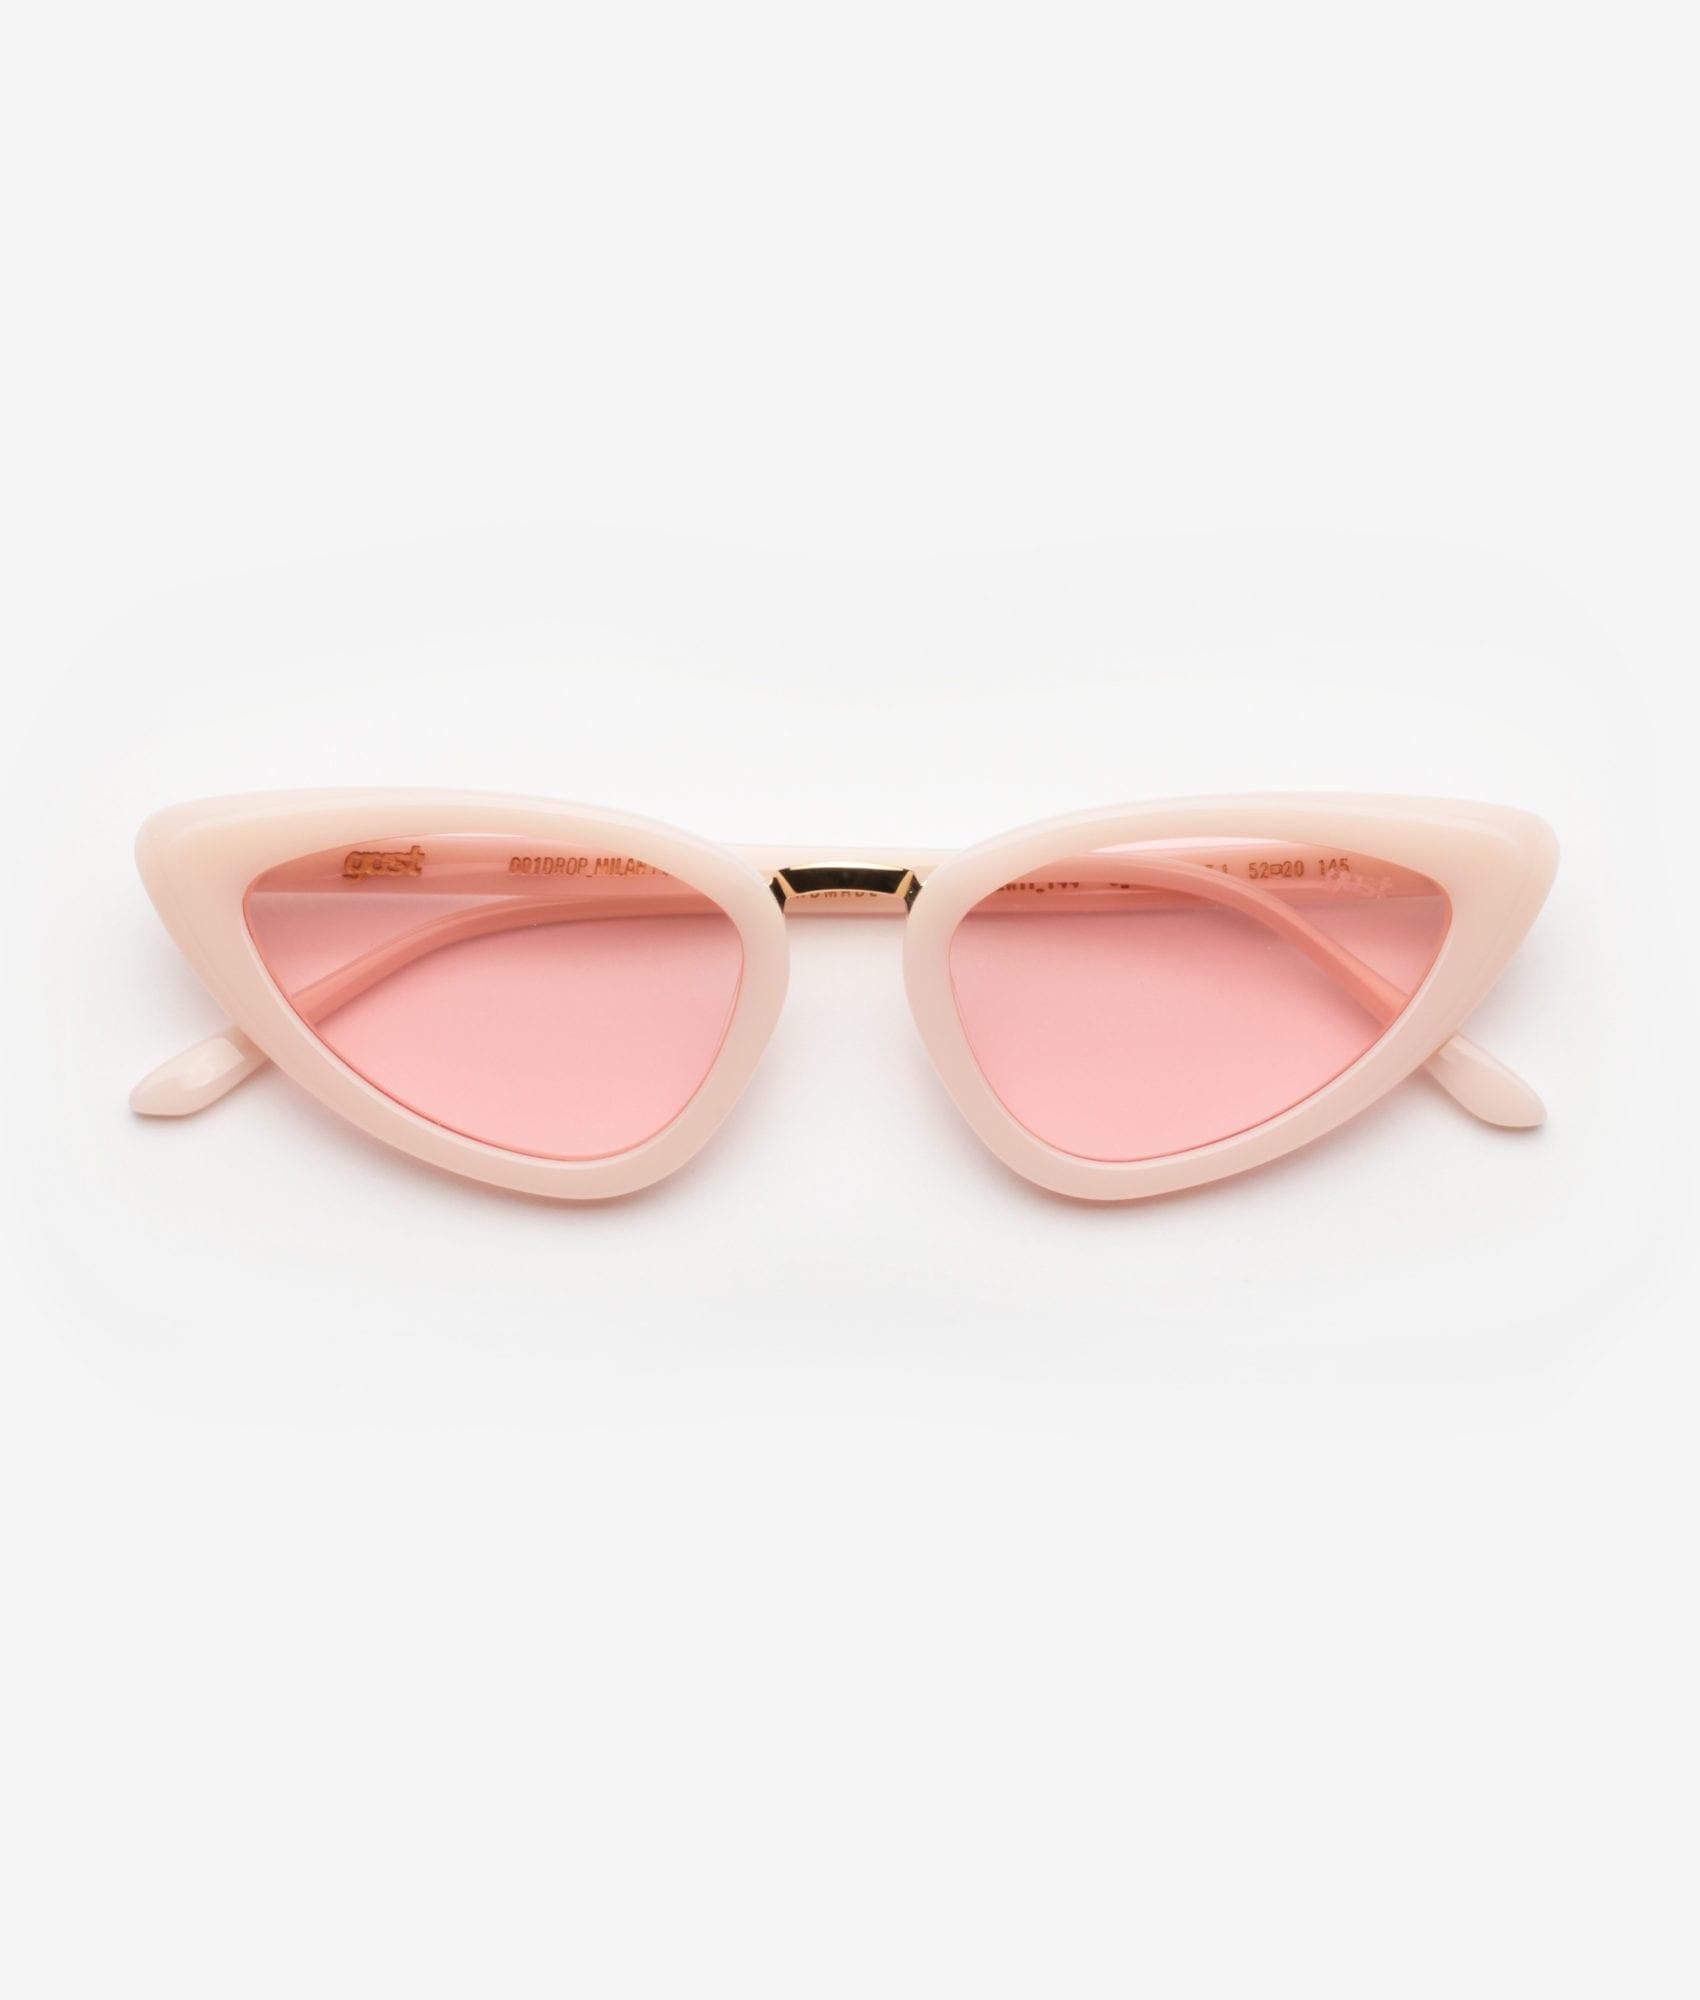 VENTI144 Pink Gast Sunglasses